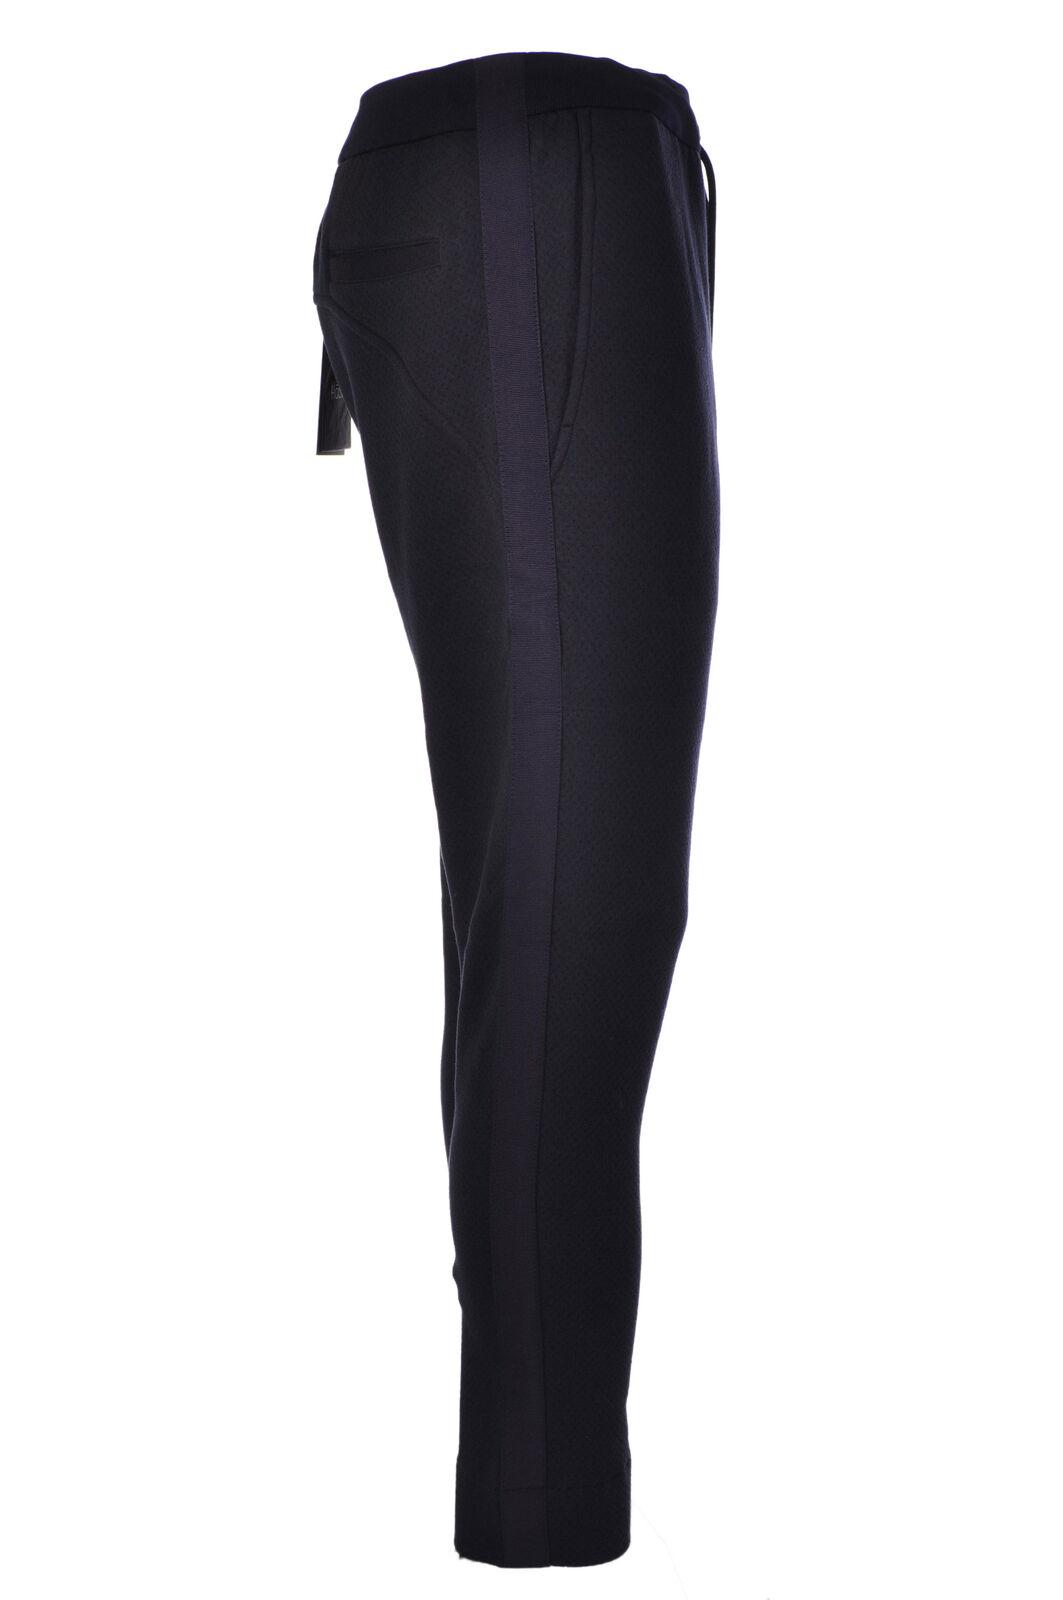 Hosio - Pants, Trousers, sweatshirt - Man - bluee - 499815C184529